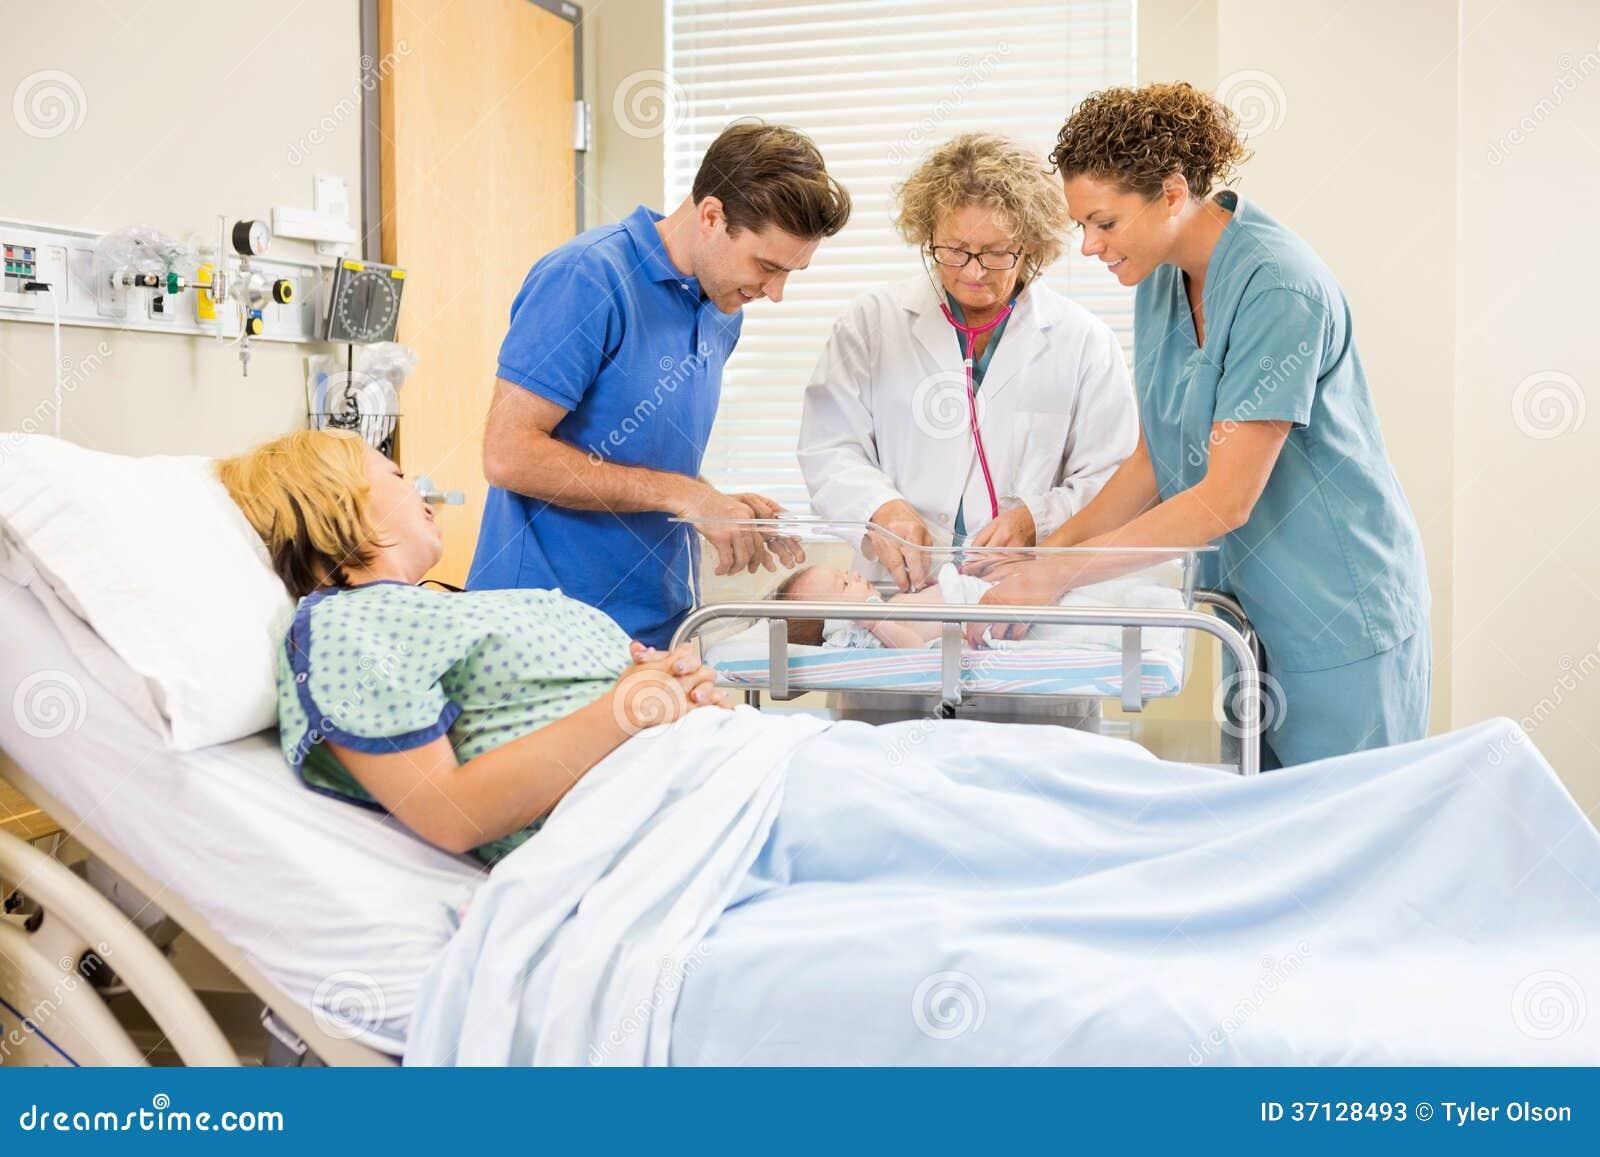 Newborn Babies In Hospital With Nurse